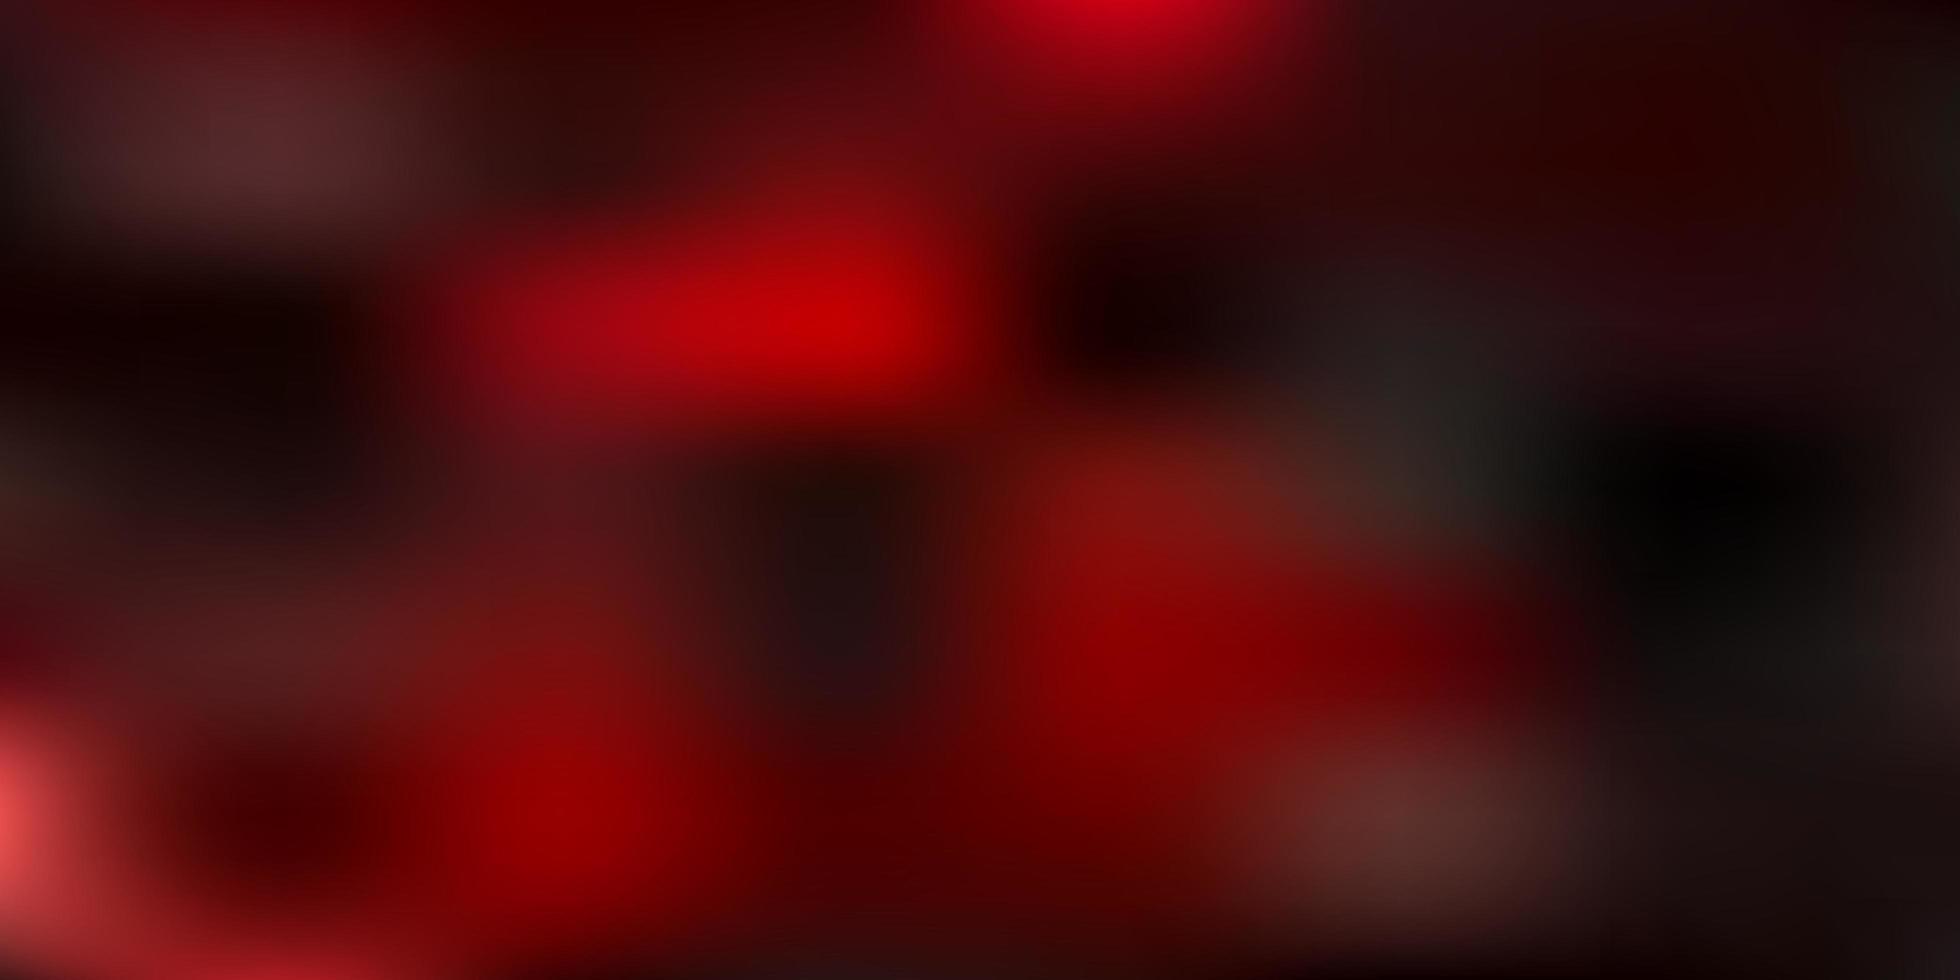 layout turva vector vermelho escuro.